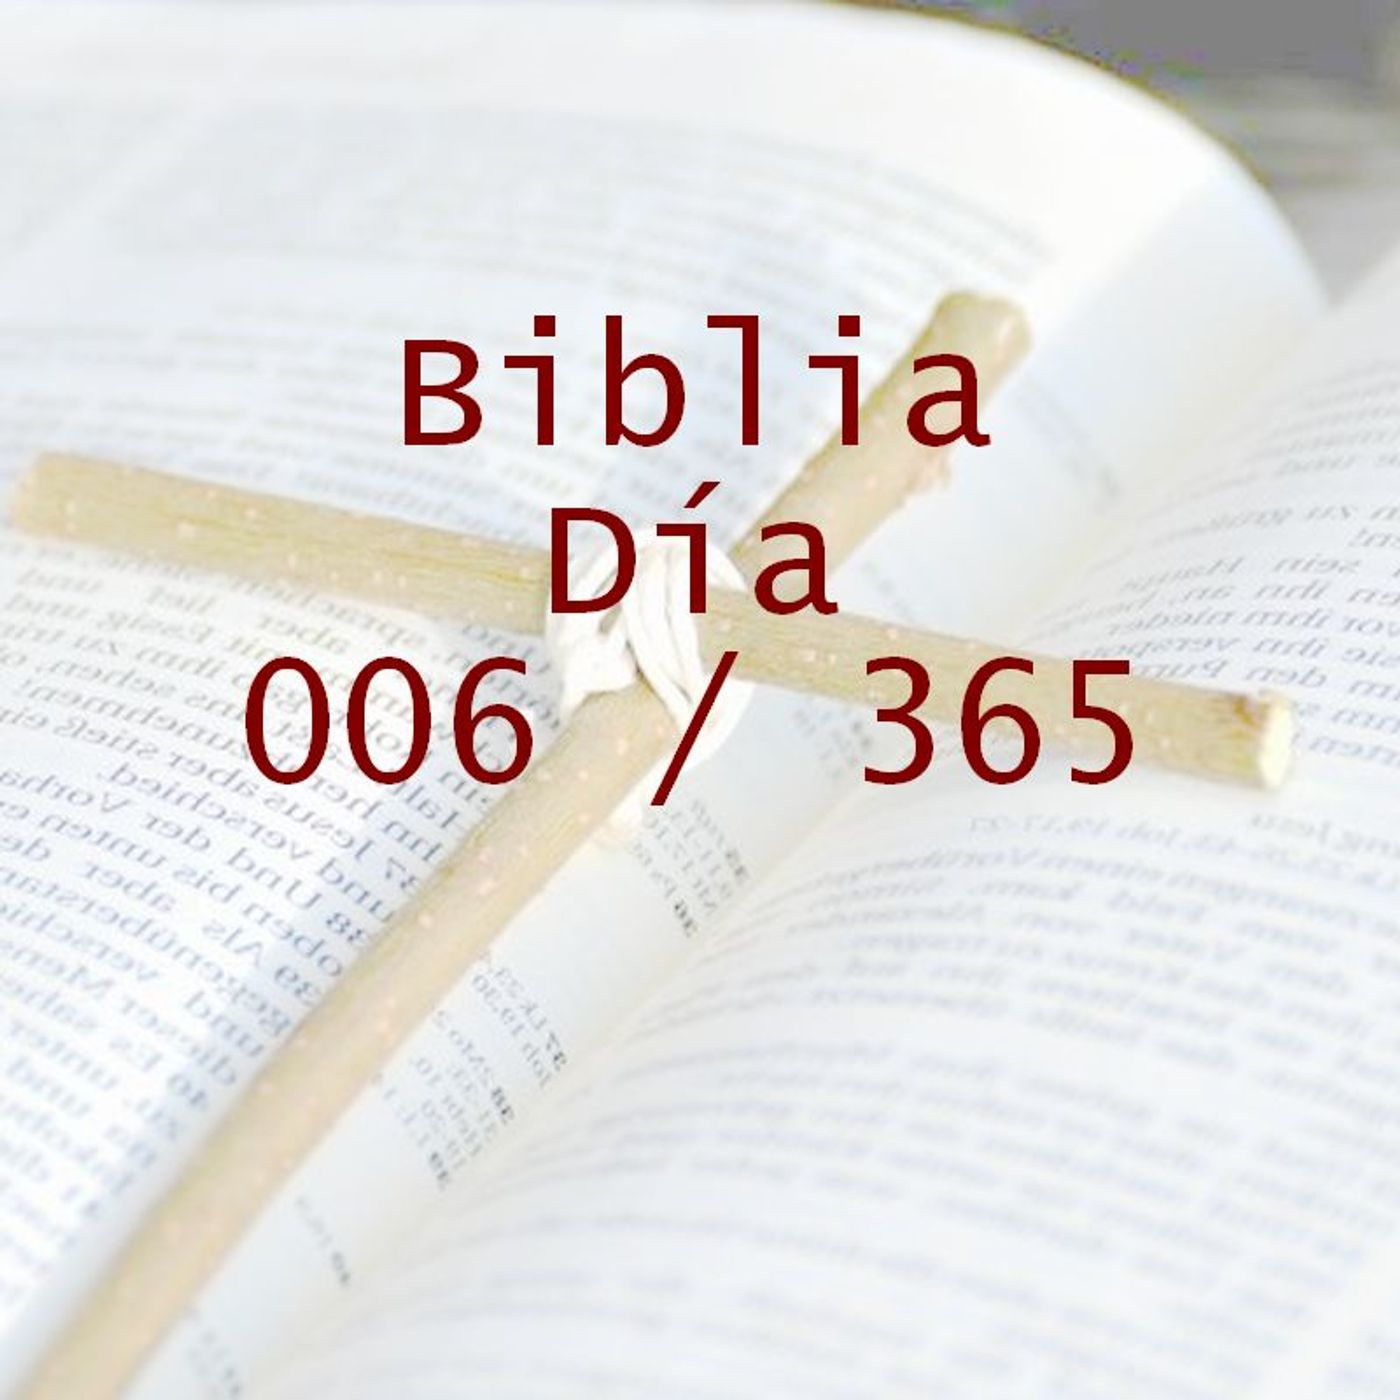 365 dias para la Biblia - Dia 006